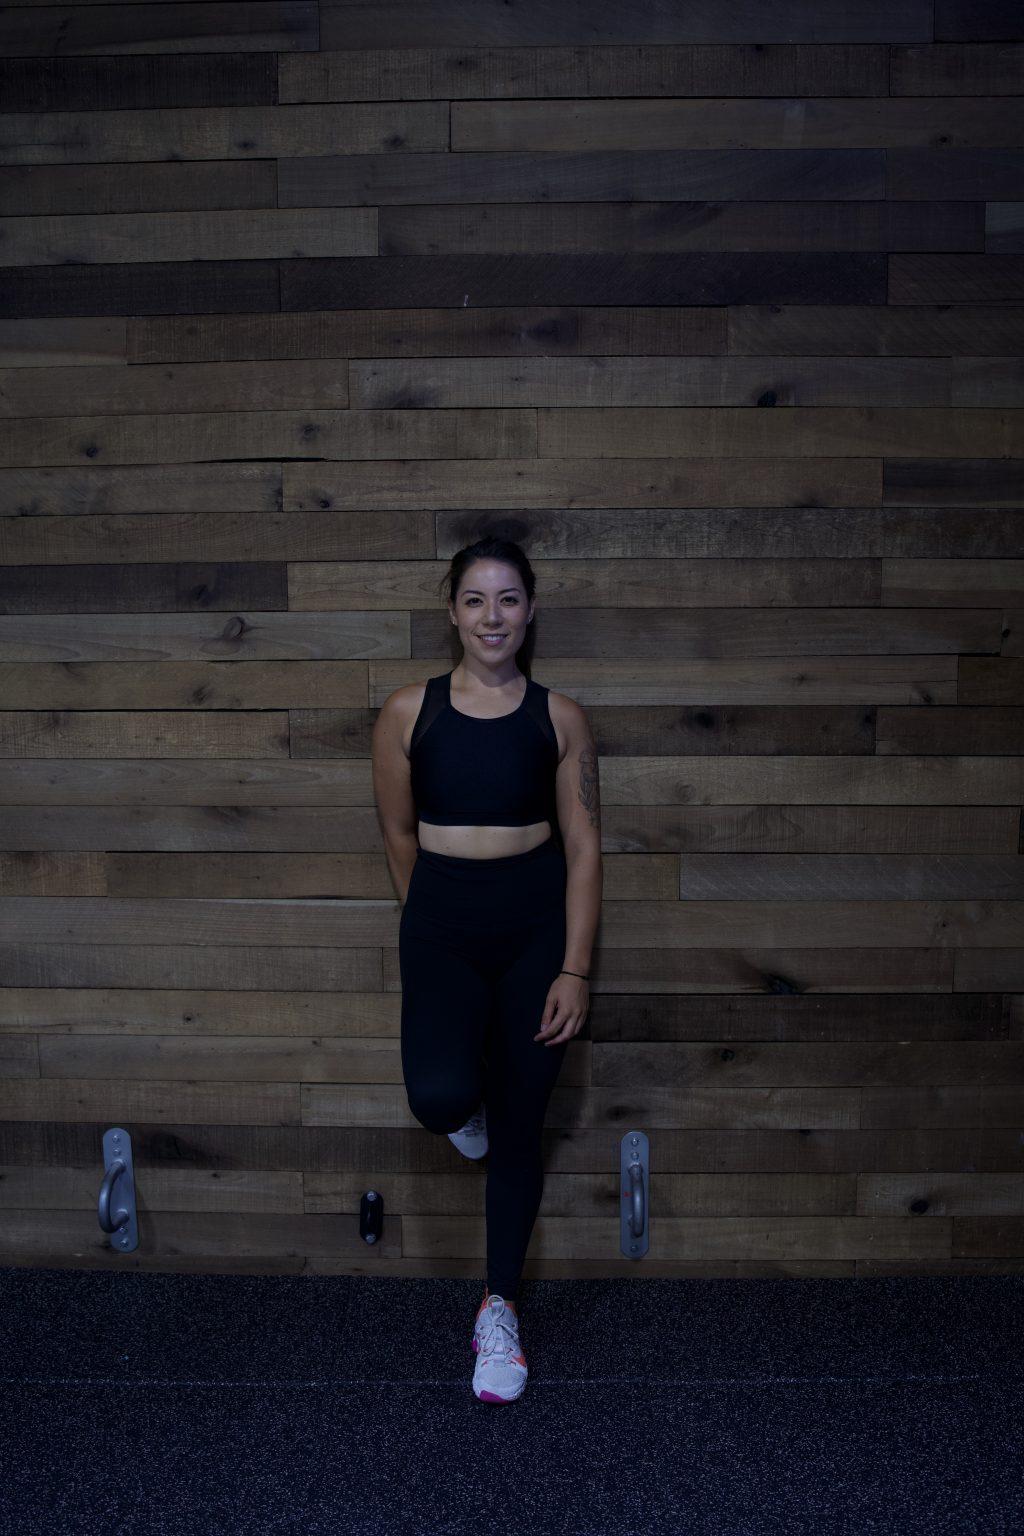 Personal Trainer Denver, Colorado - Alani Carbullido